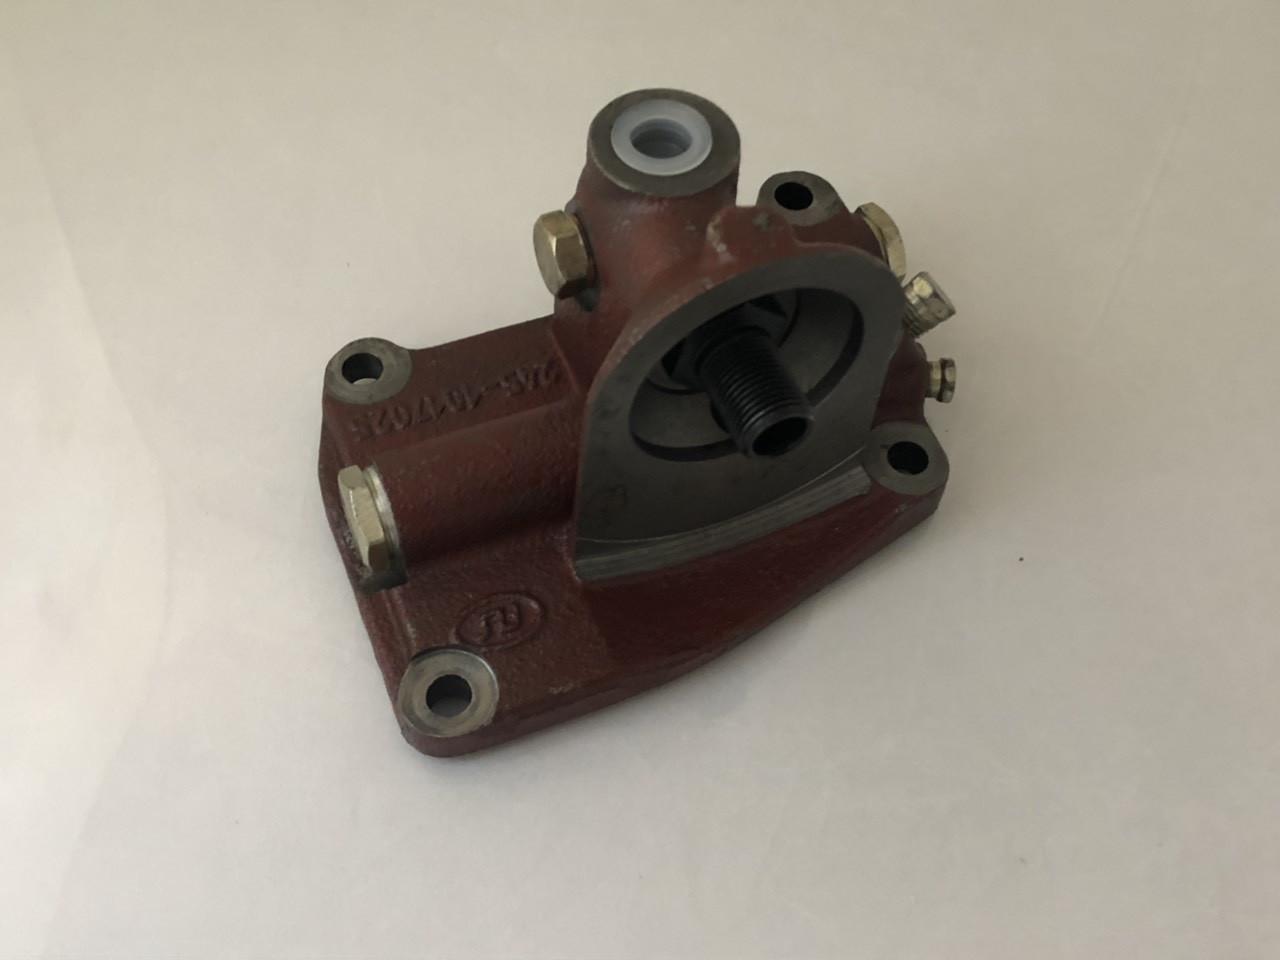 Корпус фильтра маслянного ФМ-009 МТЗ 245-1017015-Б (пр-во БЗА) тракторный